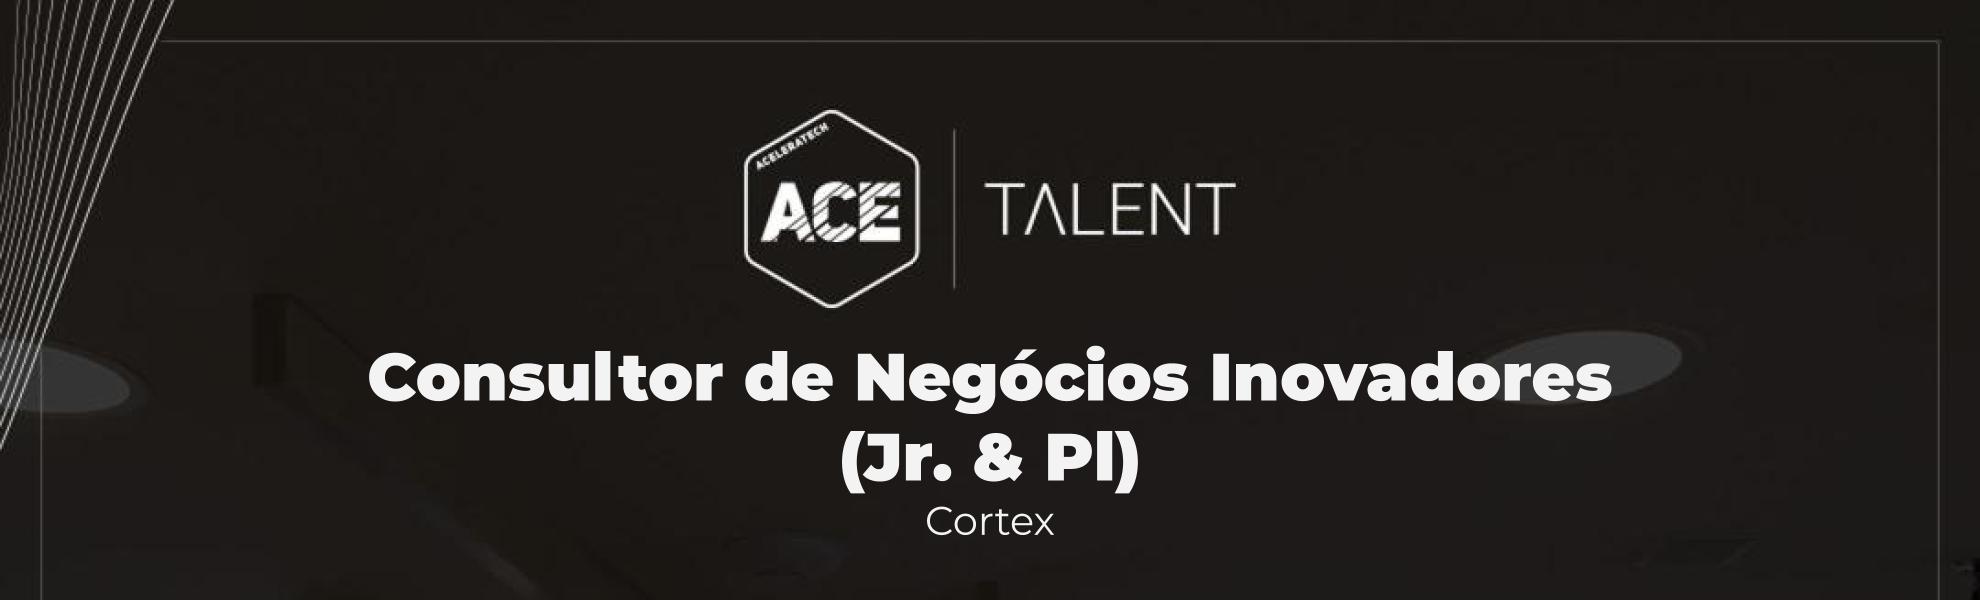 Consultor de Projetos Inovadores (Jr. & Pl)